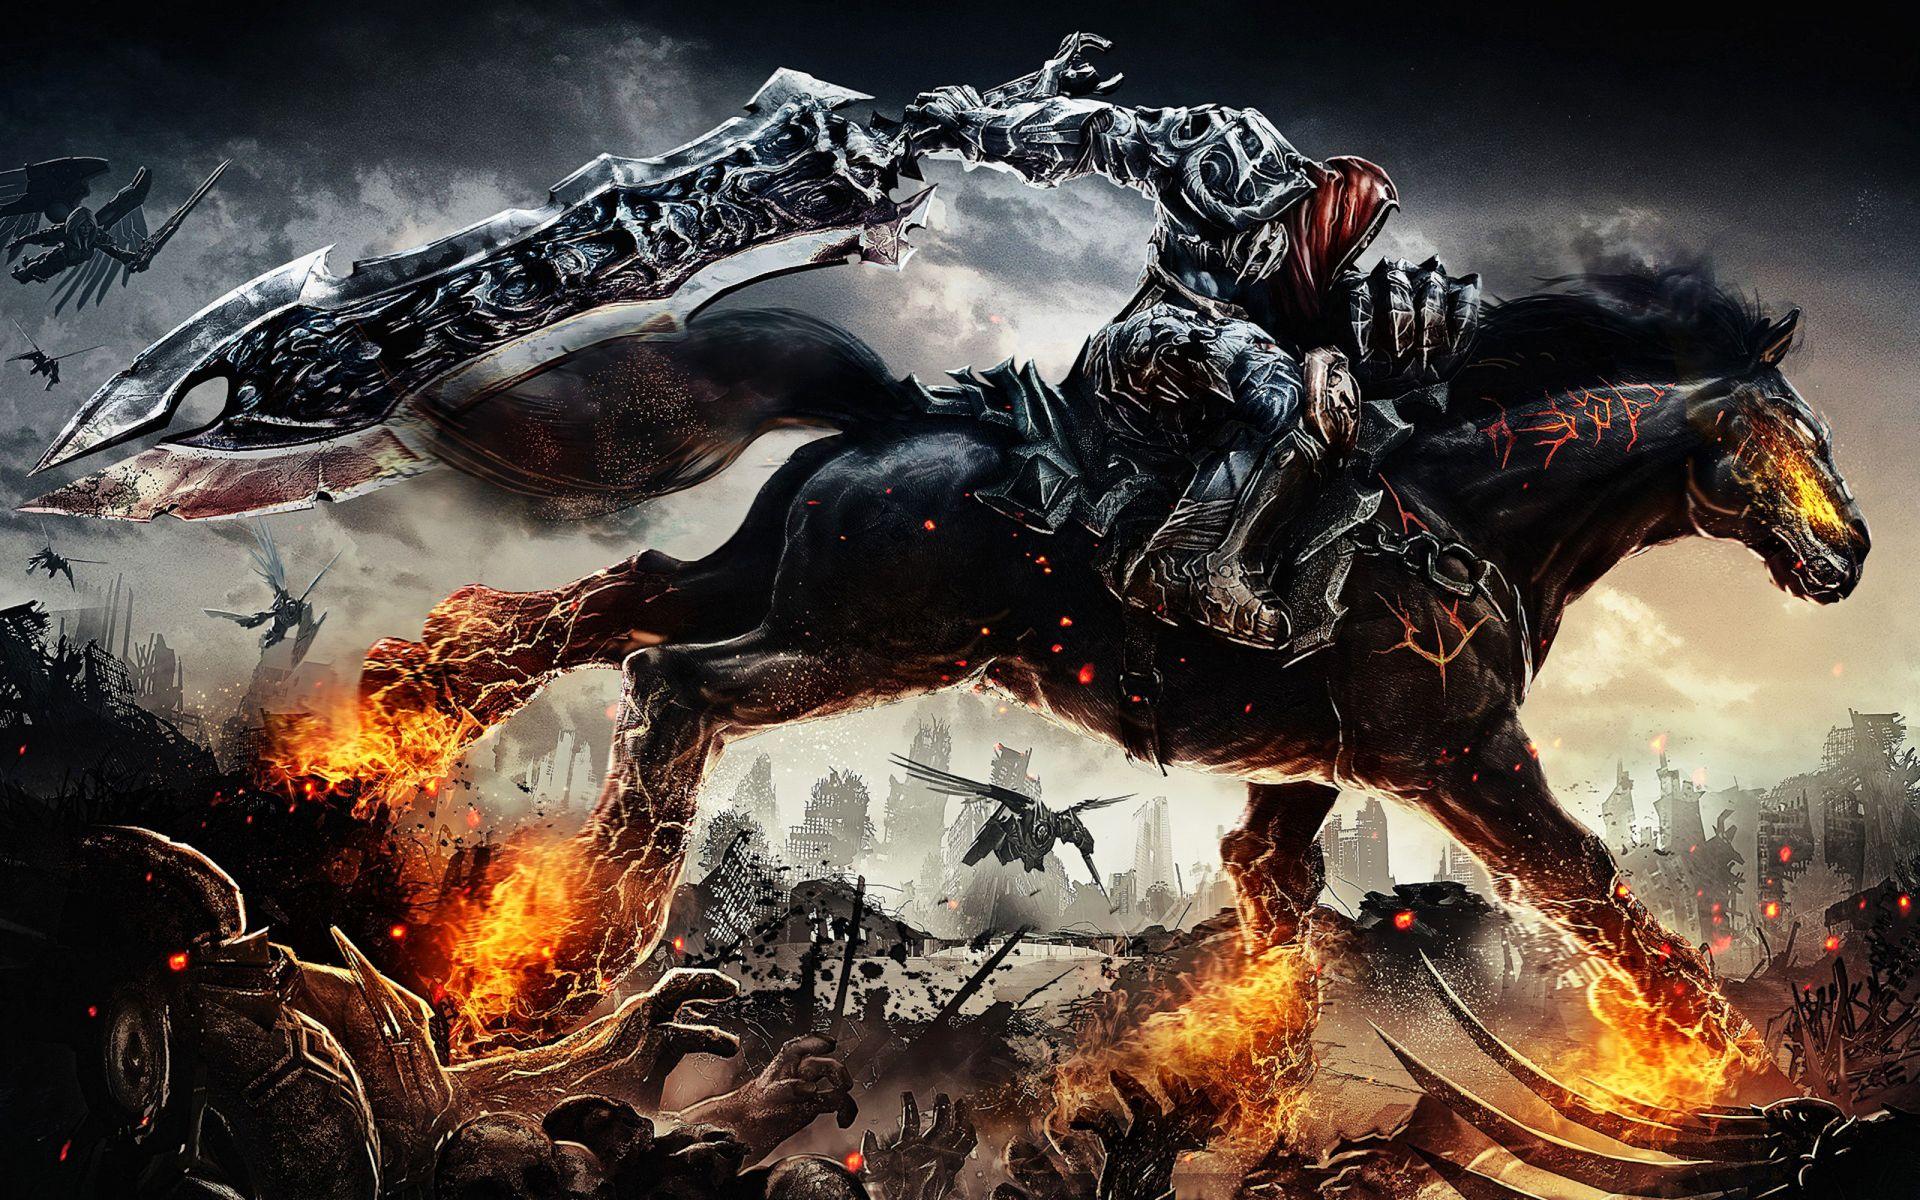 Top Wallpaper Horse Warrior - ce383871f92ccc8c681814655f9e1c29  Image_108171.jpg